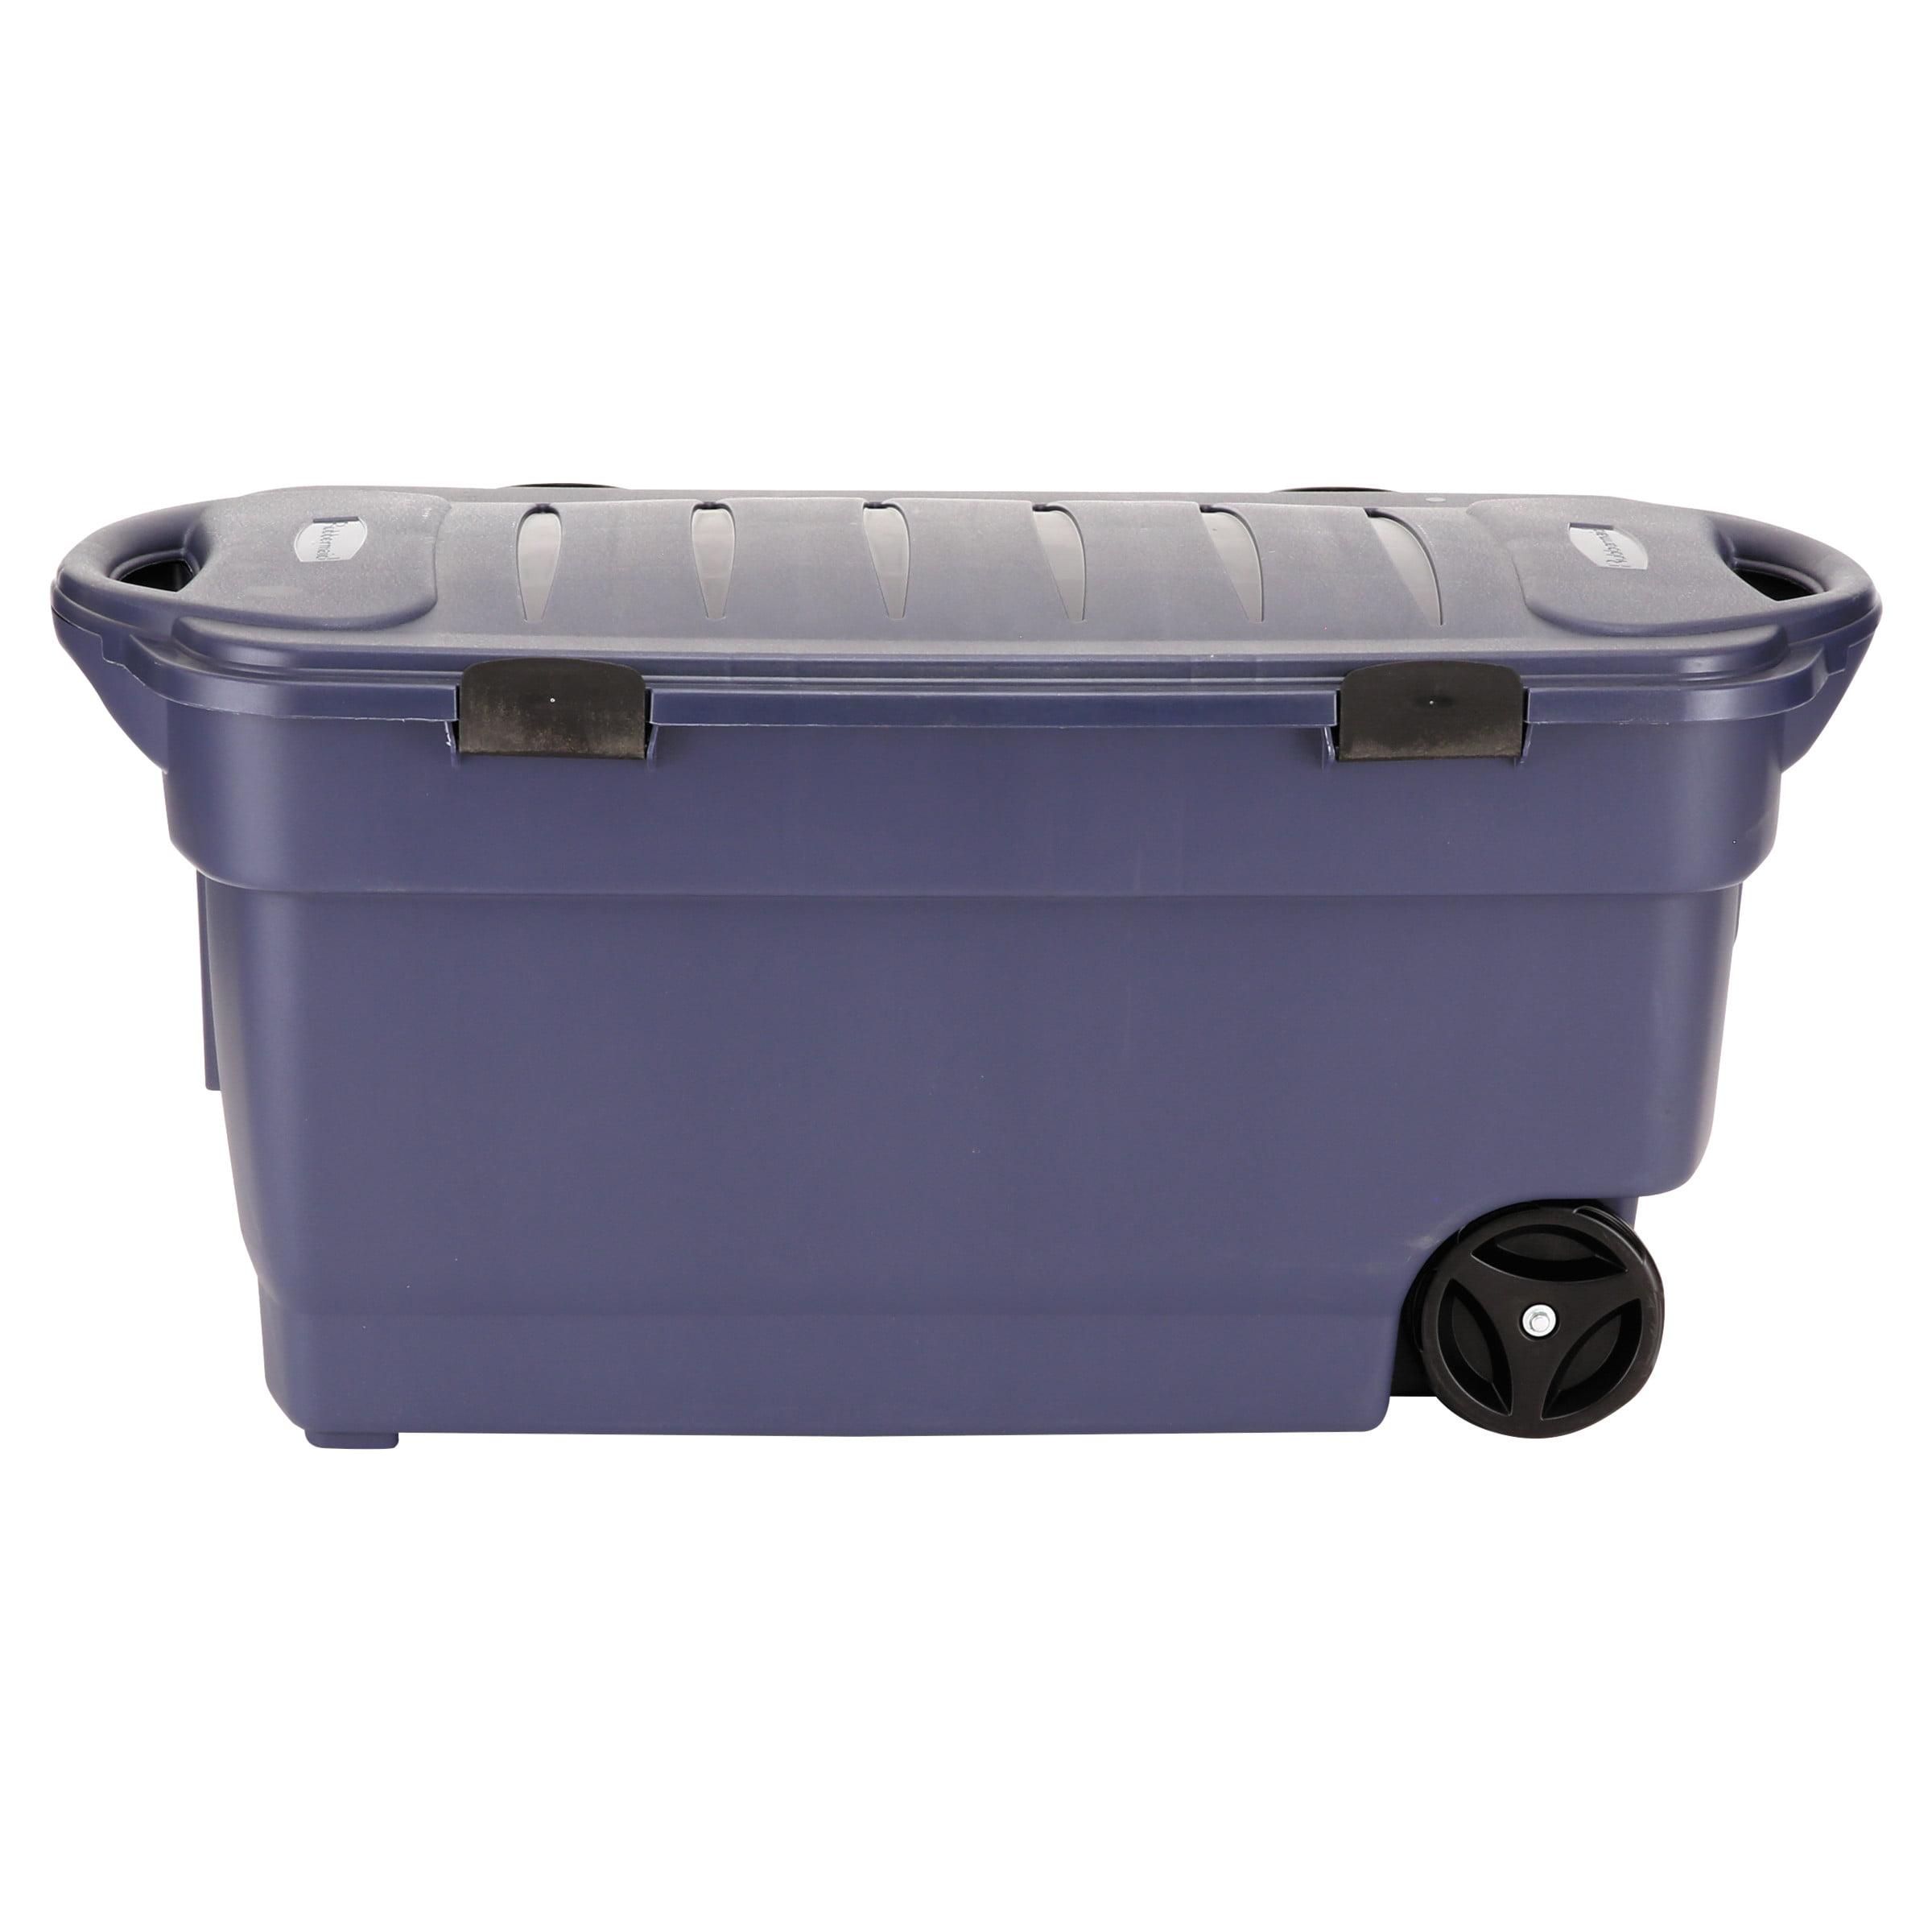 Rubbermaid Roughneck Wheeled Storage Box, 45gal, Dark Indigo Metallic by Rubbermaid